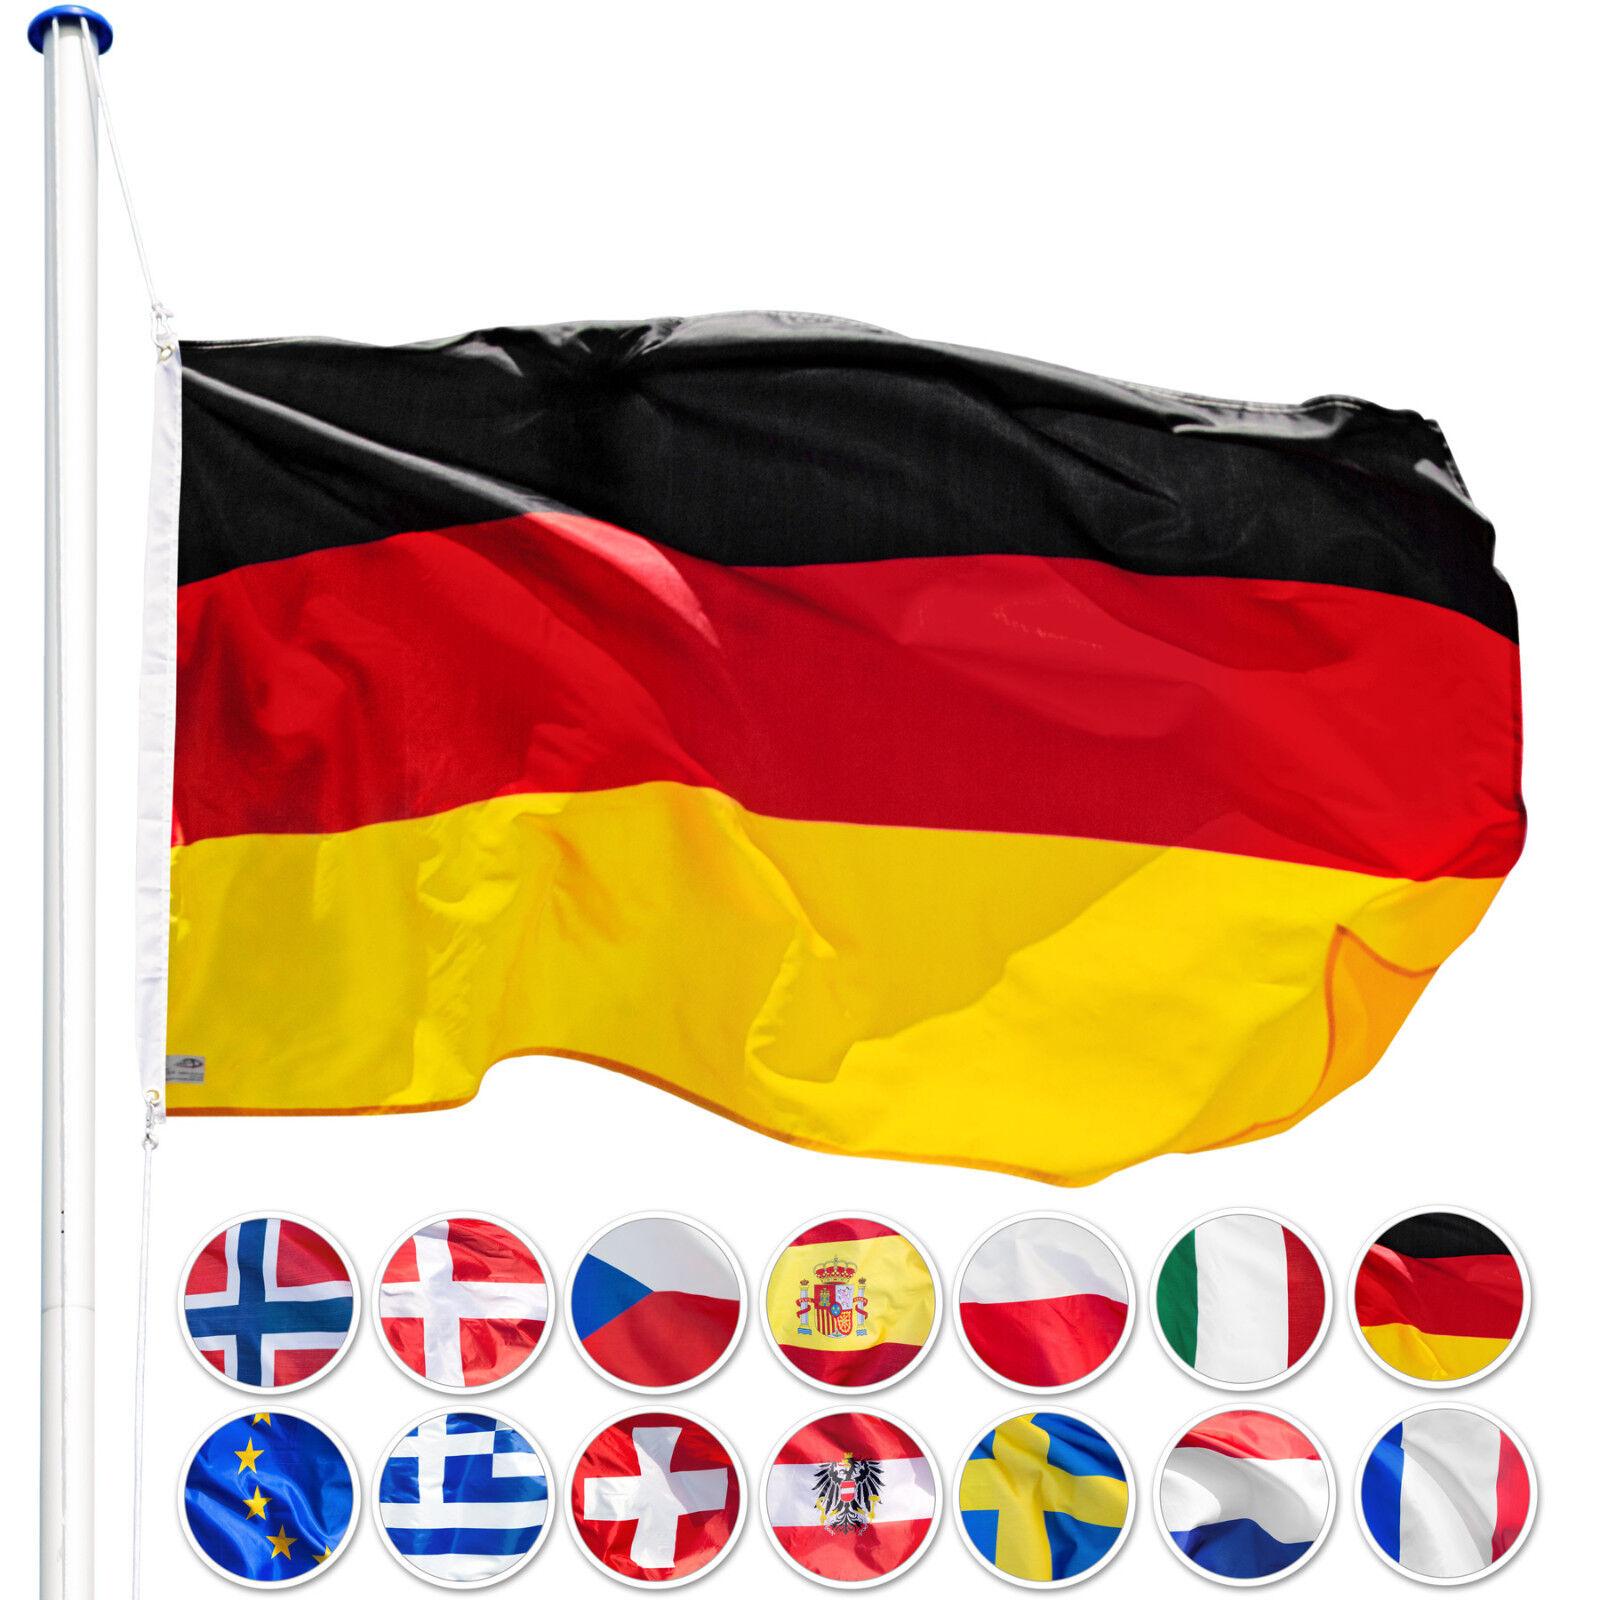 Alu Fahnenmast 6,25 m Mast Flagge Seilzug Bodenhülse Flaggenmast plus Fahne Neu